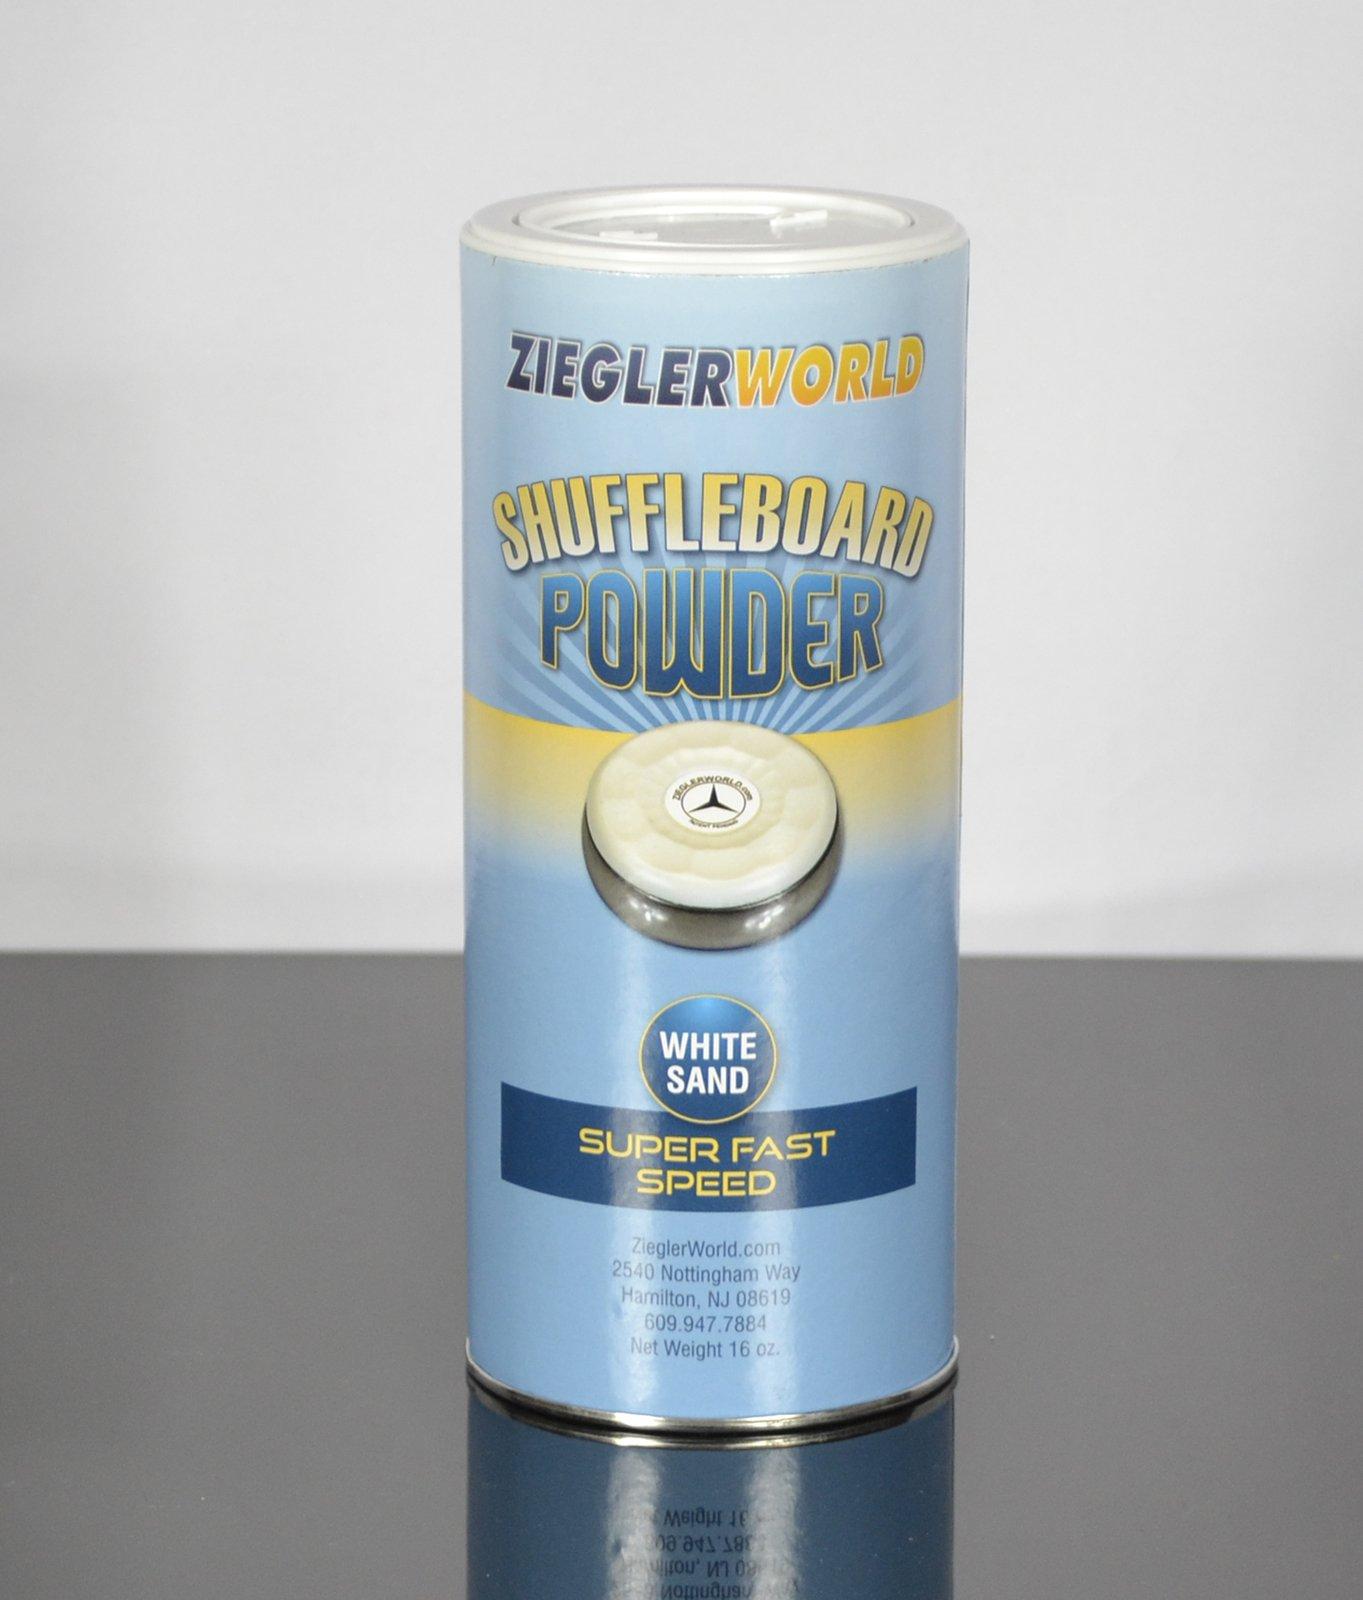 Zieglerworld 1 can White Sand Table Shuffleboard Powder Wax - Super Fast Speed